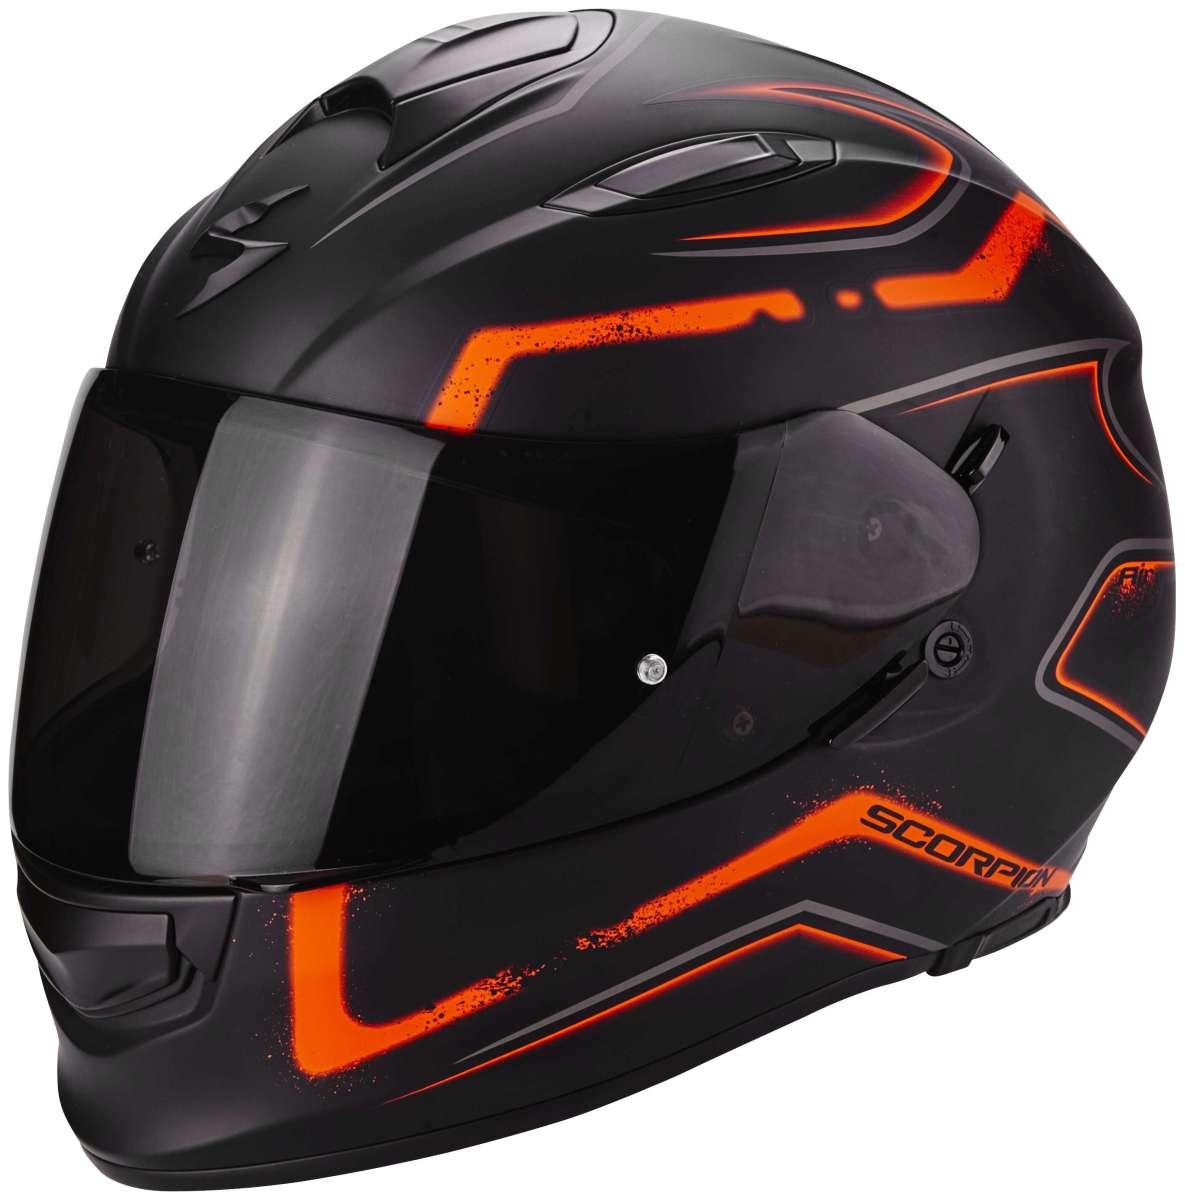 scorpion exo 510 air radium integralhelm matt schwarz orange cs bikewear. Black Bedroom Furniture Sets. Home Design Ideas